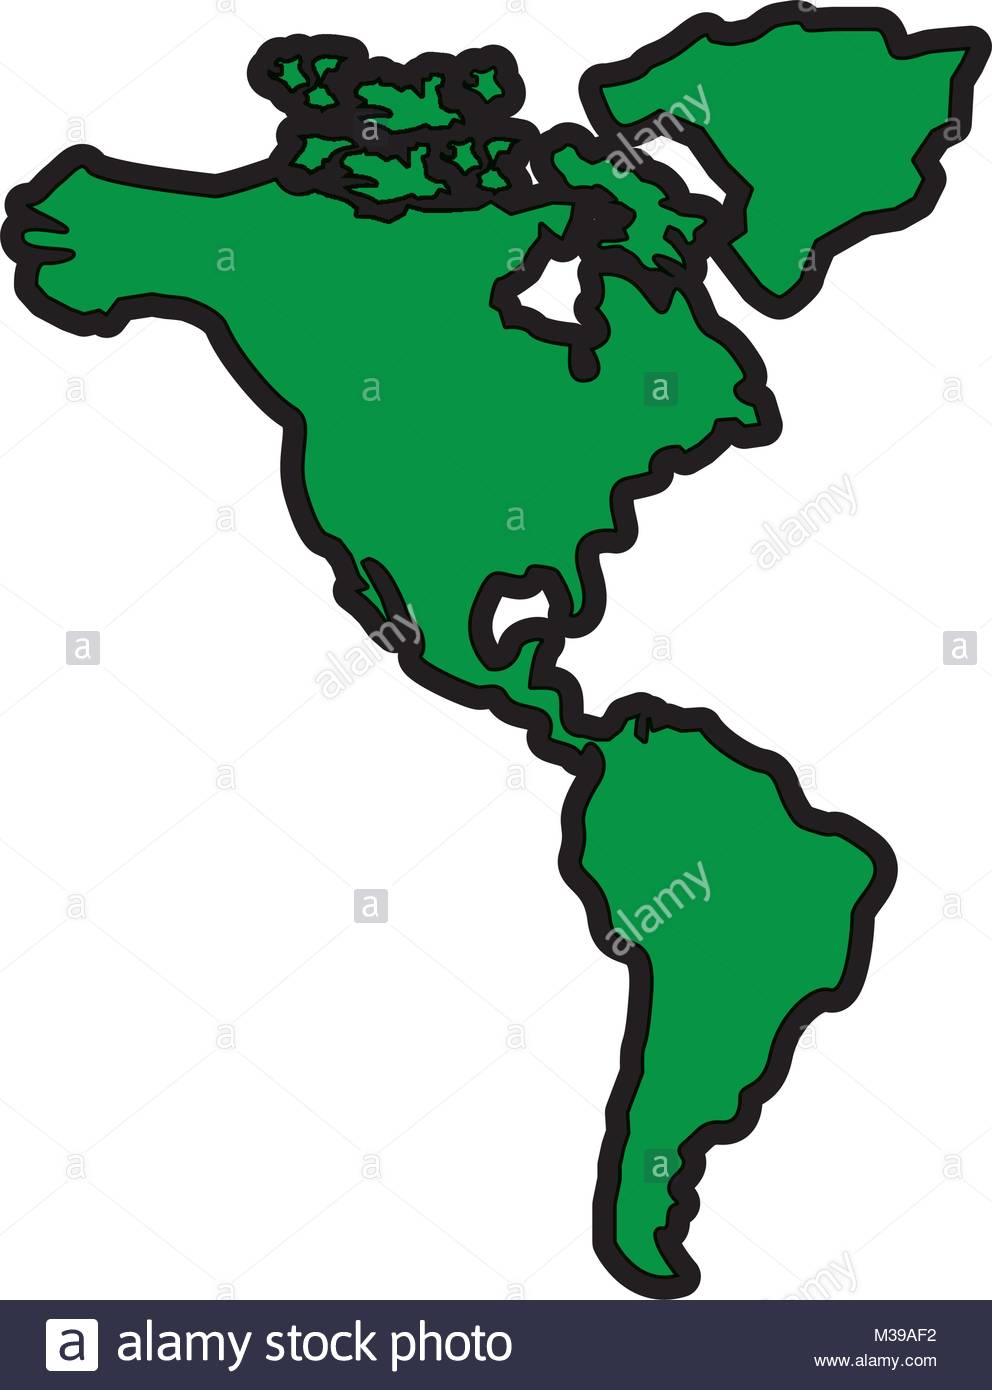 992x1390 North America Map Clip Art Wiring Diagram